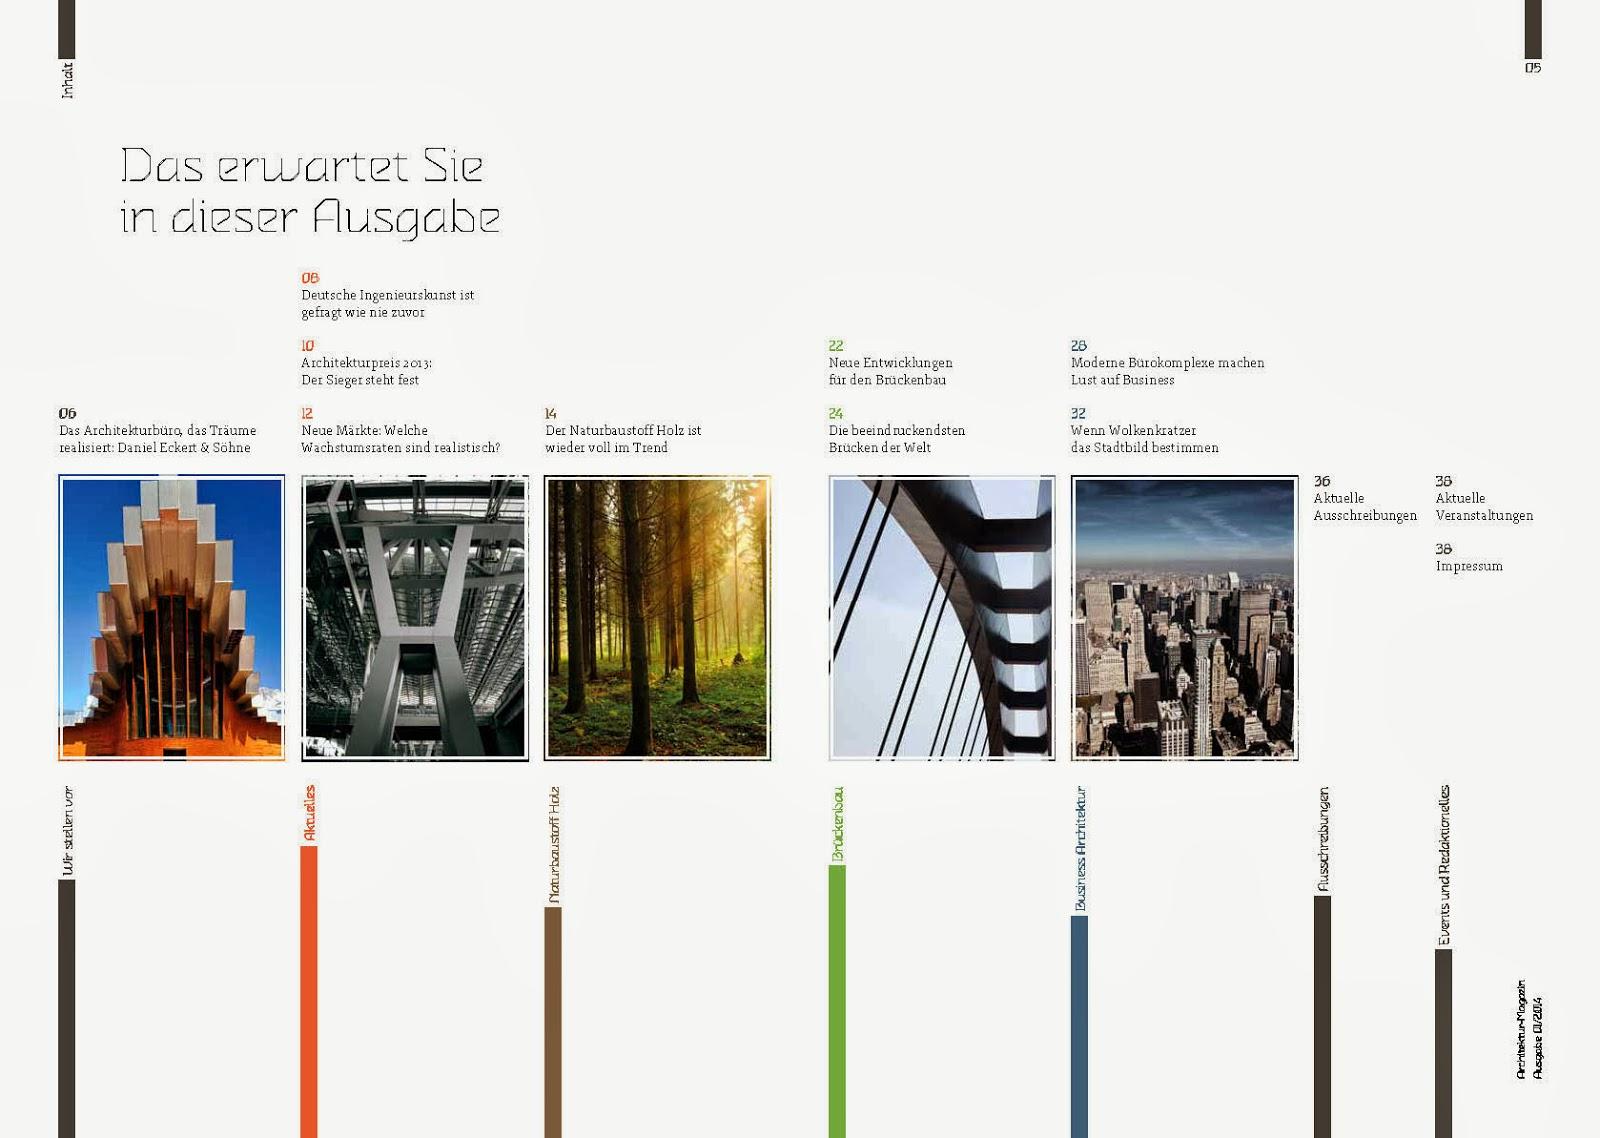 Editorial Design Magazine On Architecture Hcg Corporate